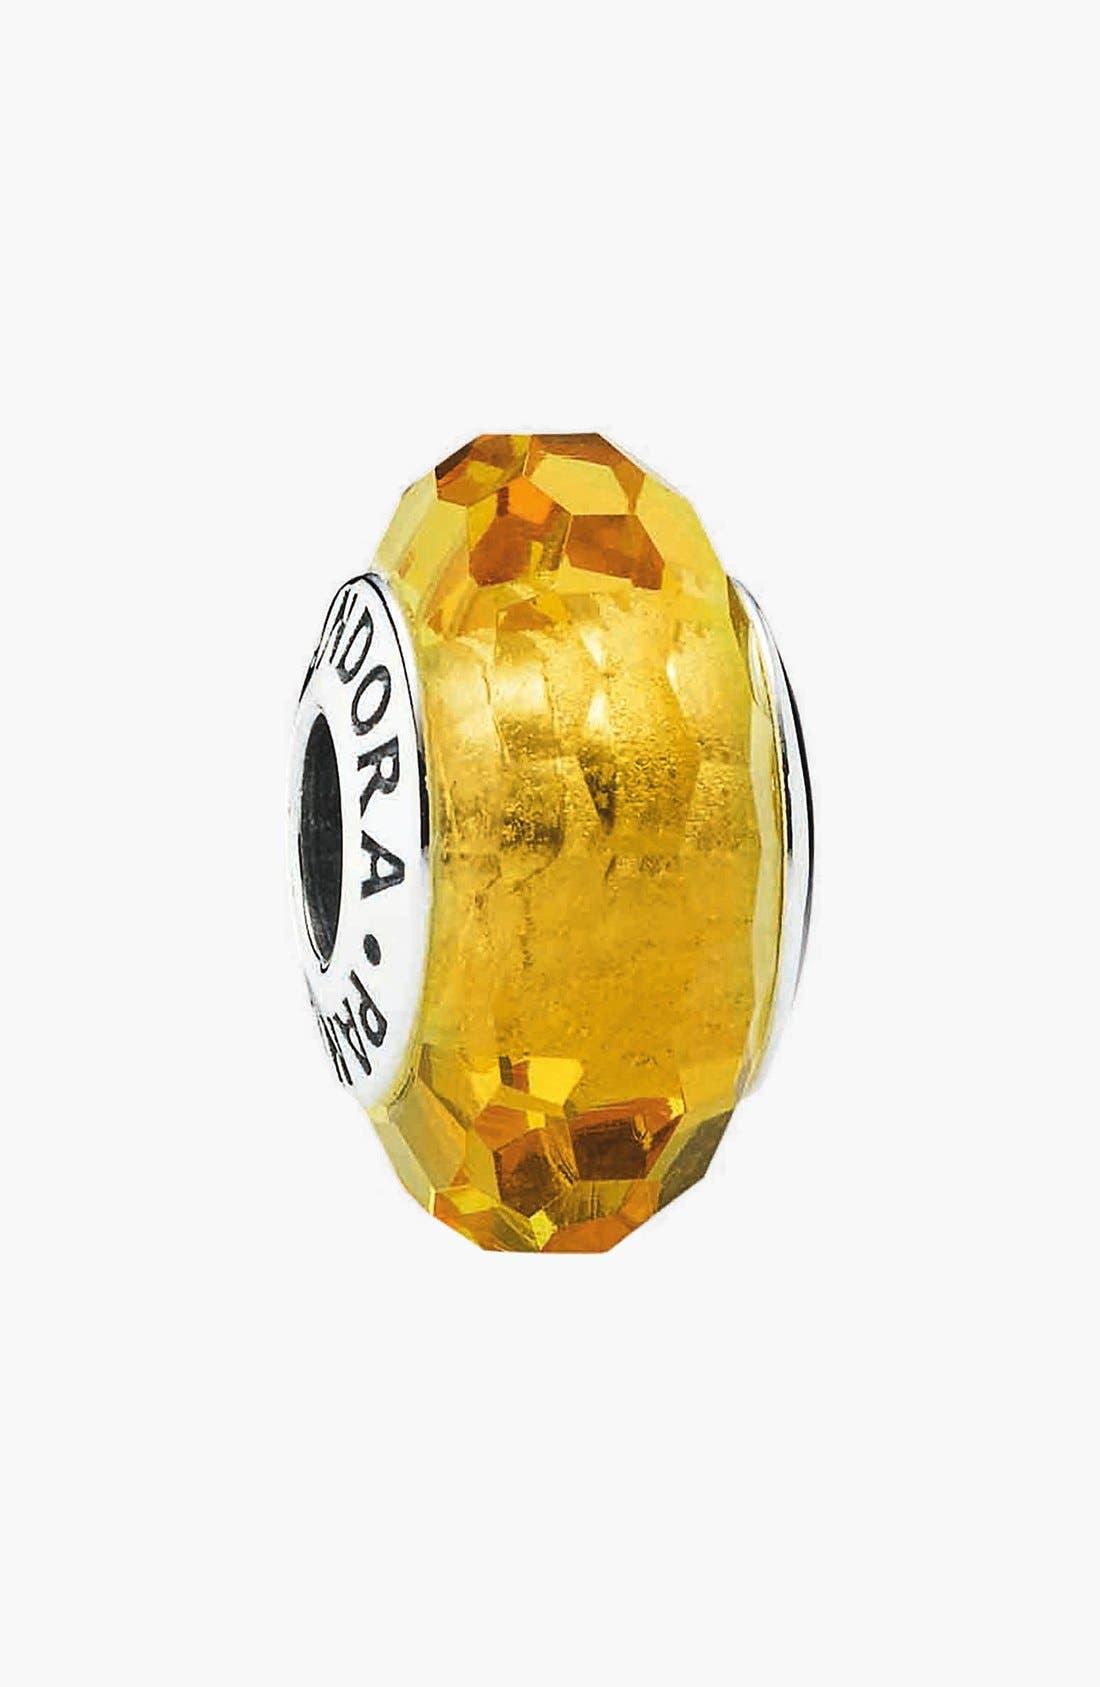 Alternate Image 1 Selected - PANDORA 'Fascinating' Murano Glass Bead Charm